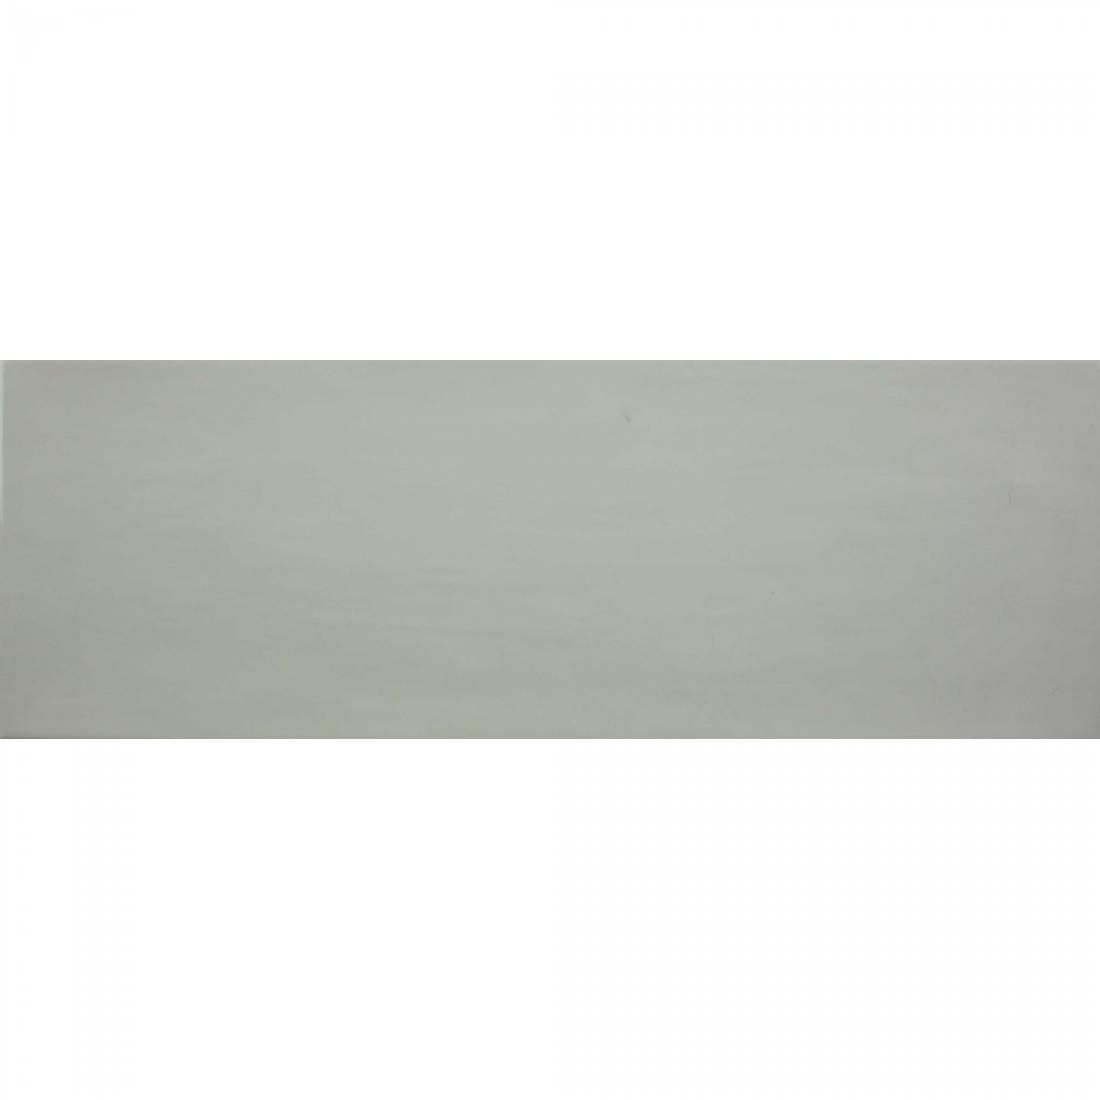 Arlette 21.4x61 Blanco Gloss 1